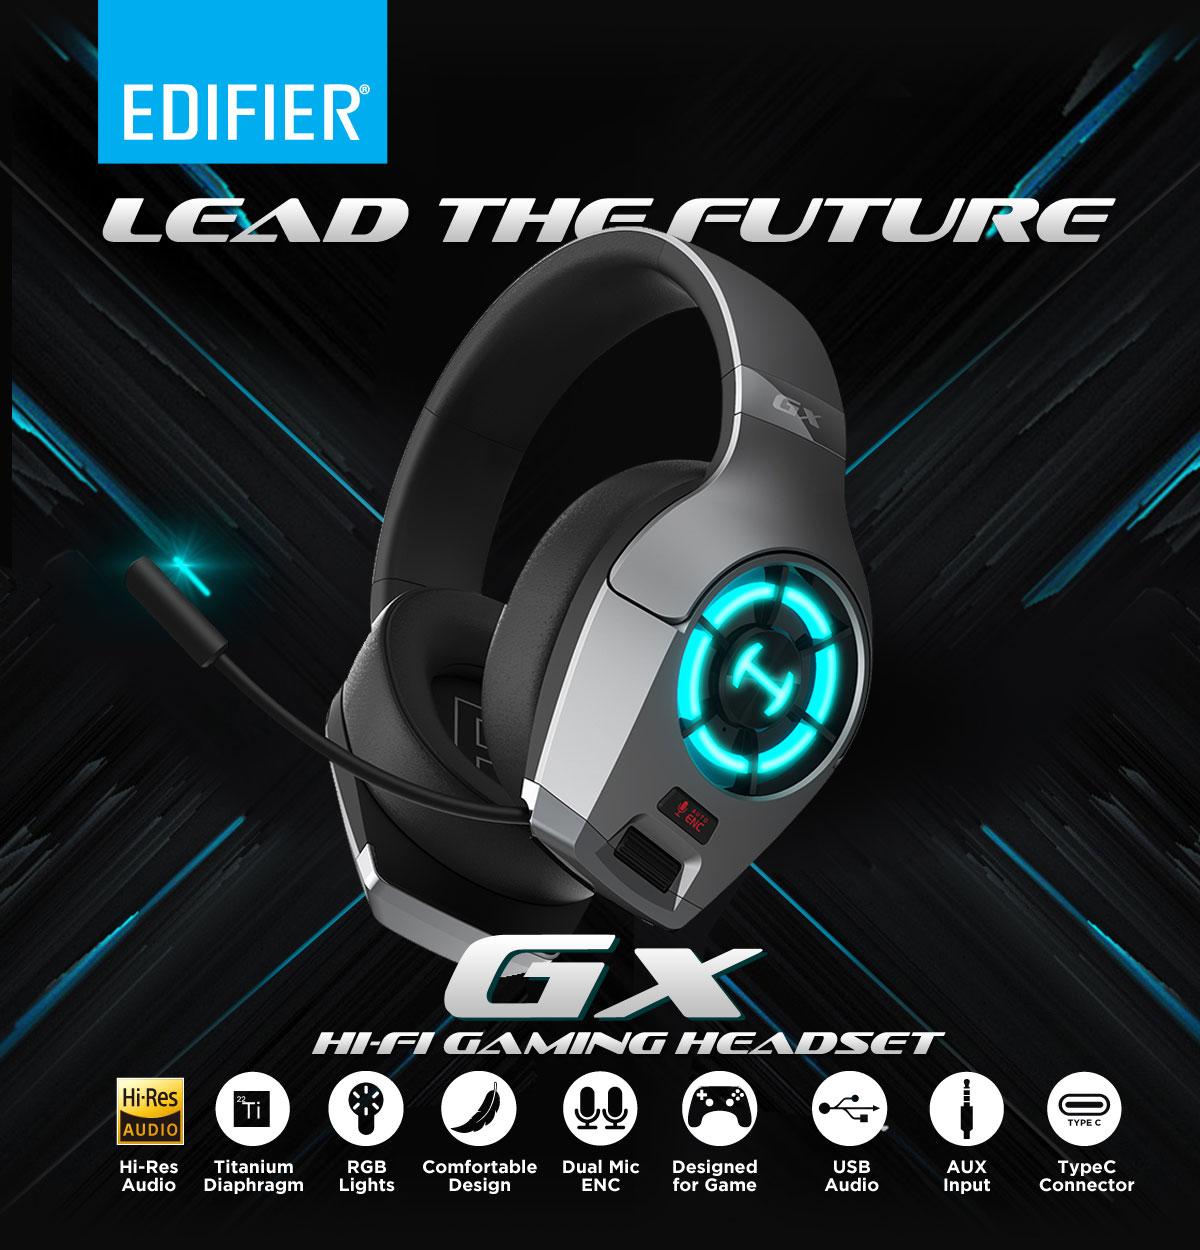 Edifier GX Gaming Headphone